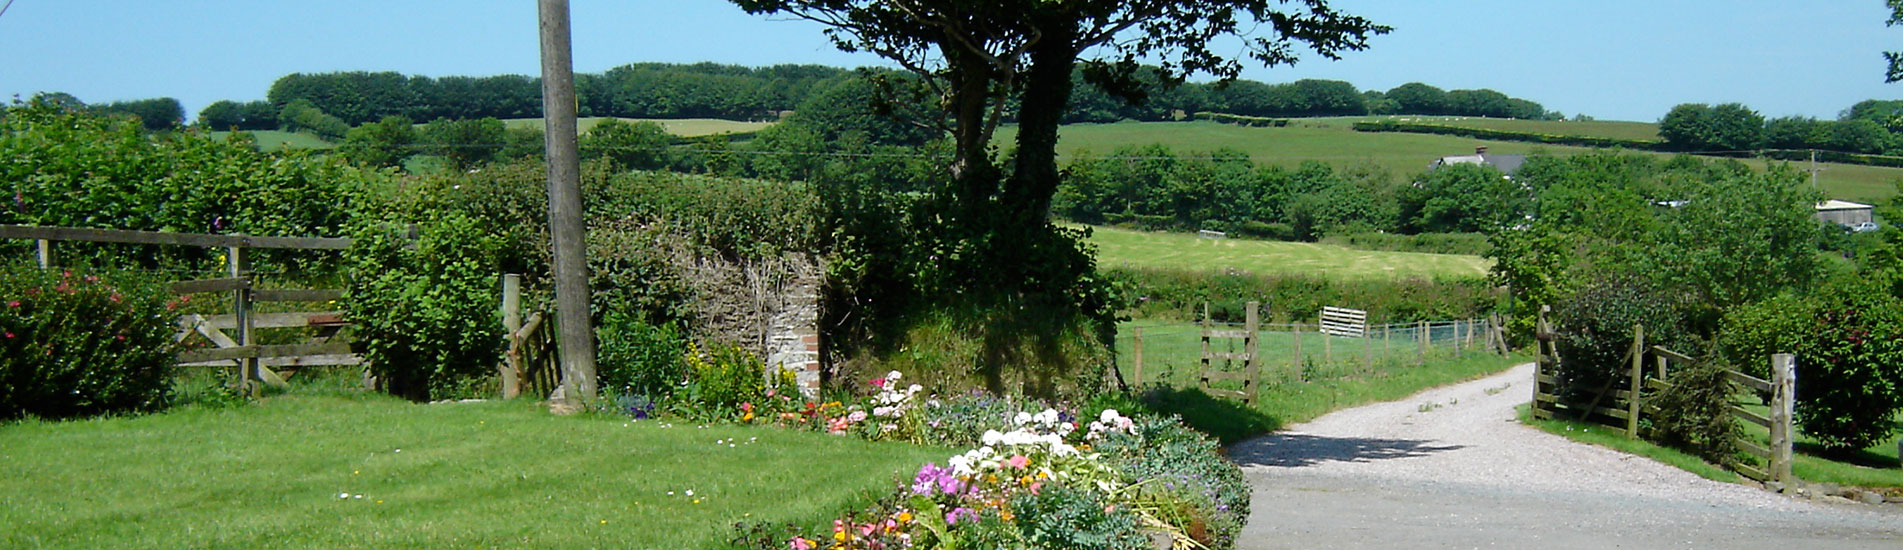 Views at Kimbland Farm, Devon